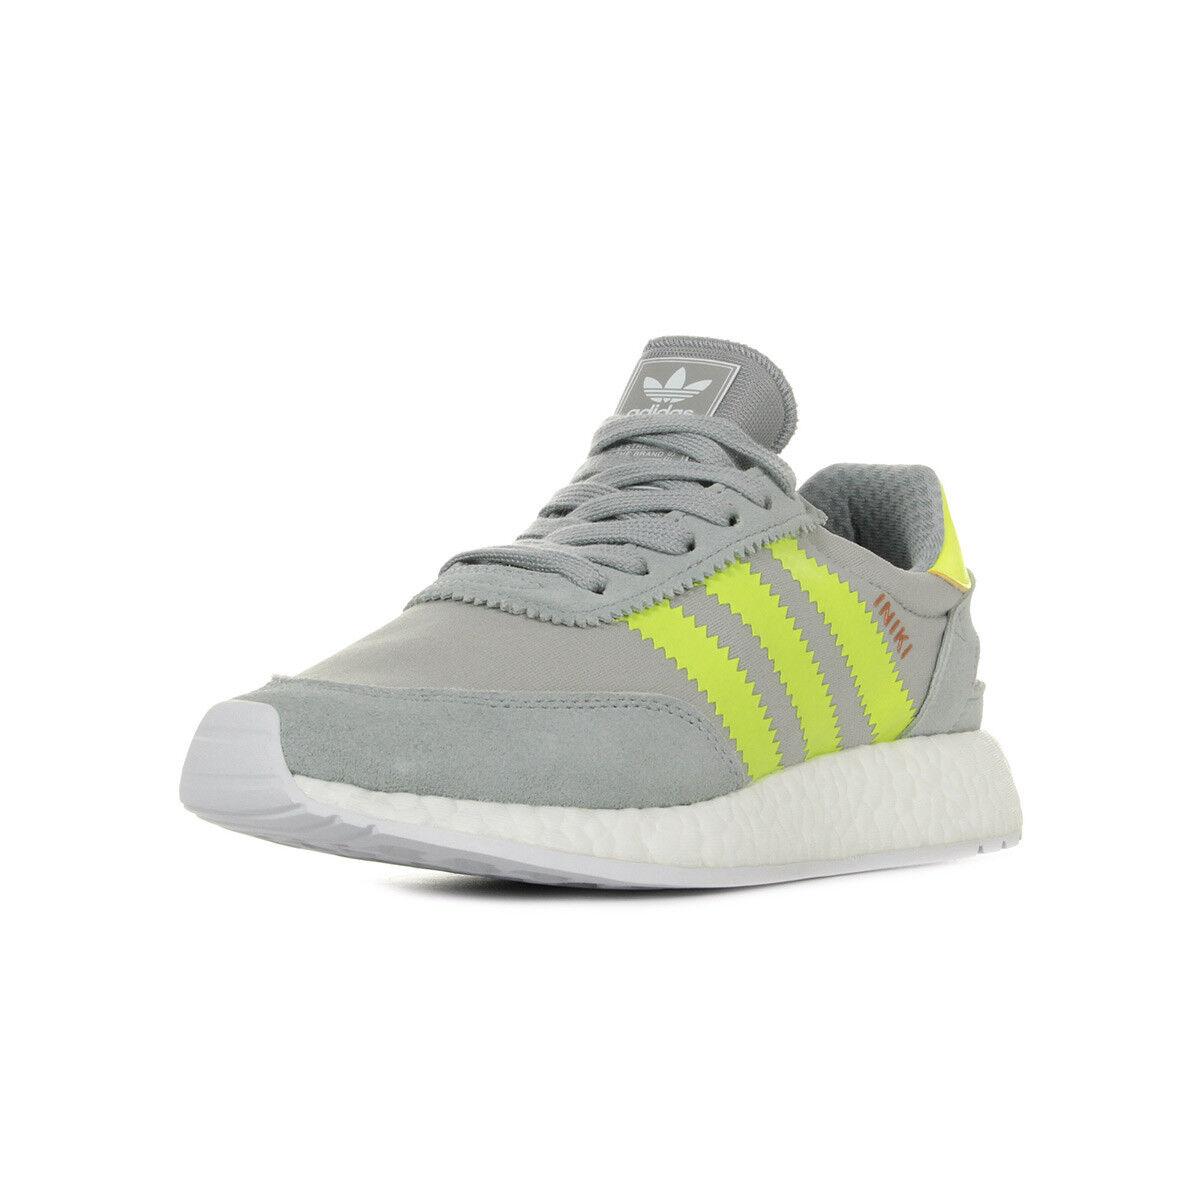 Schuhe adidas Damen Iniki Runner W grau